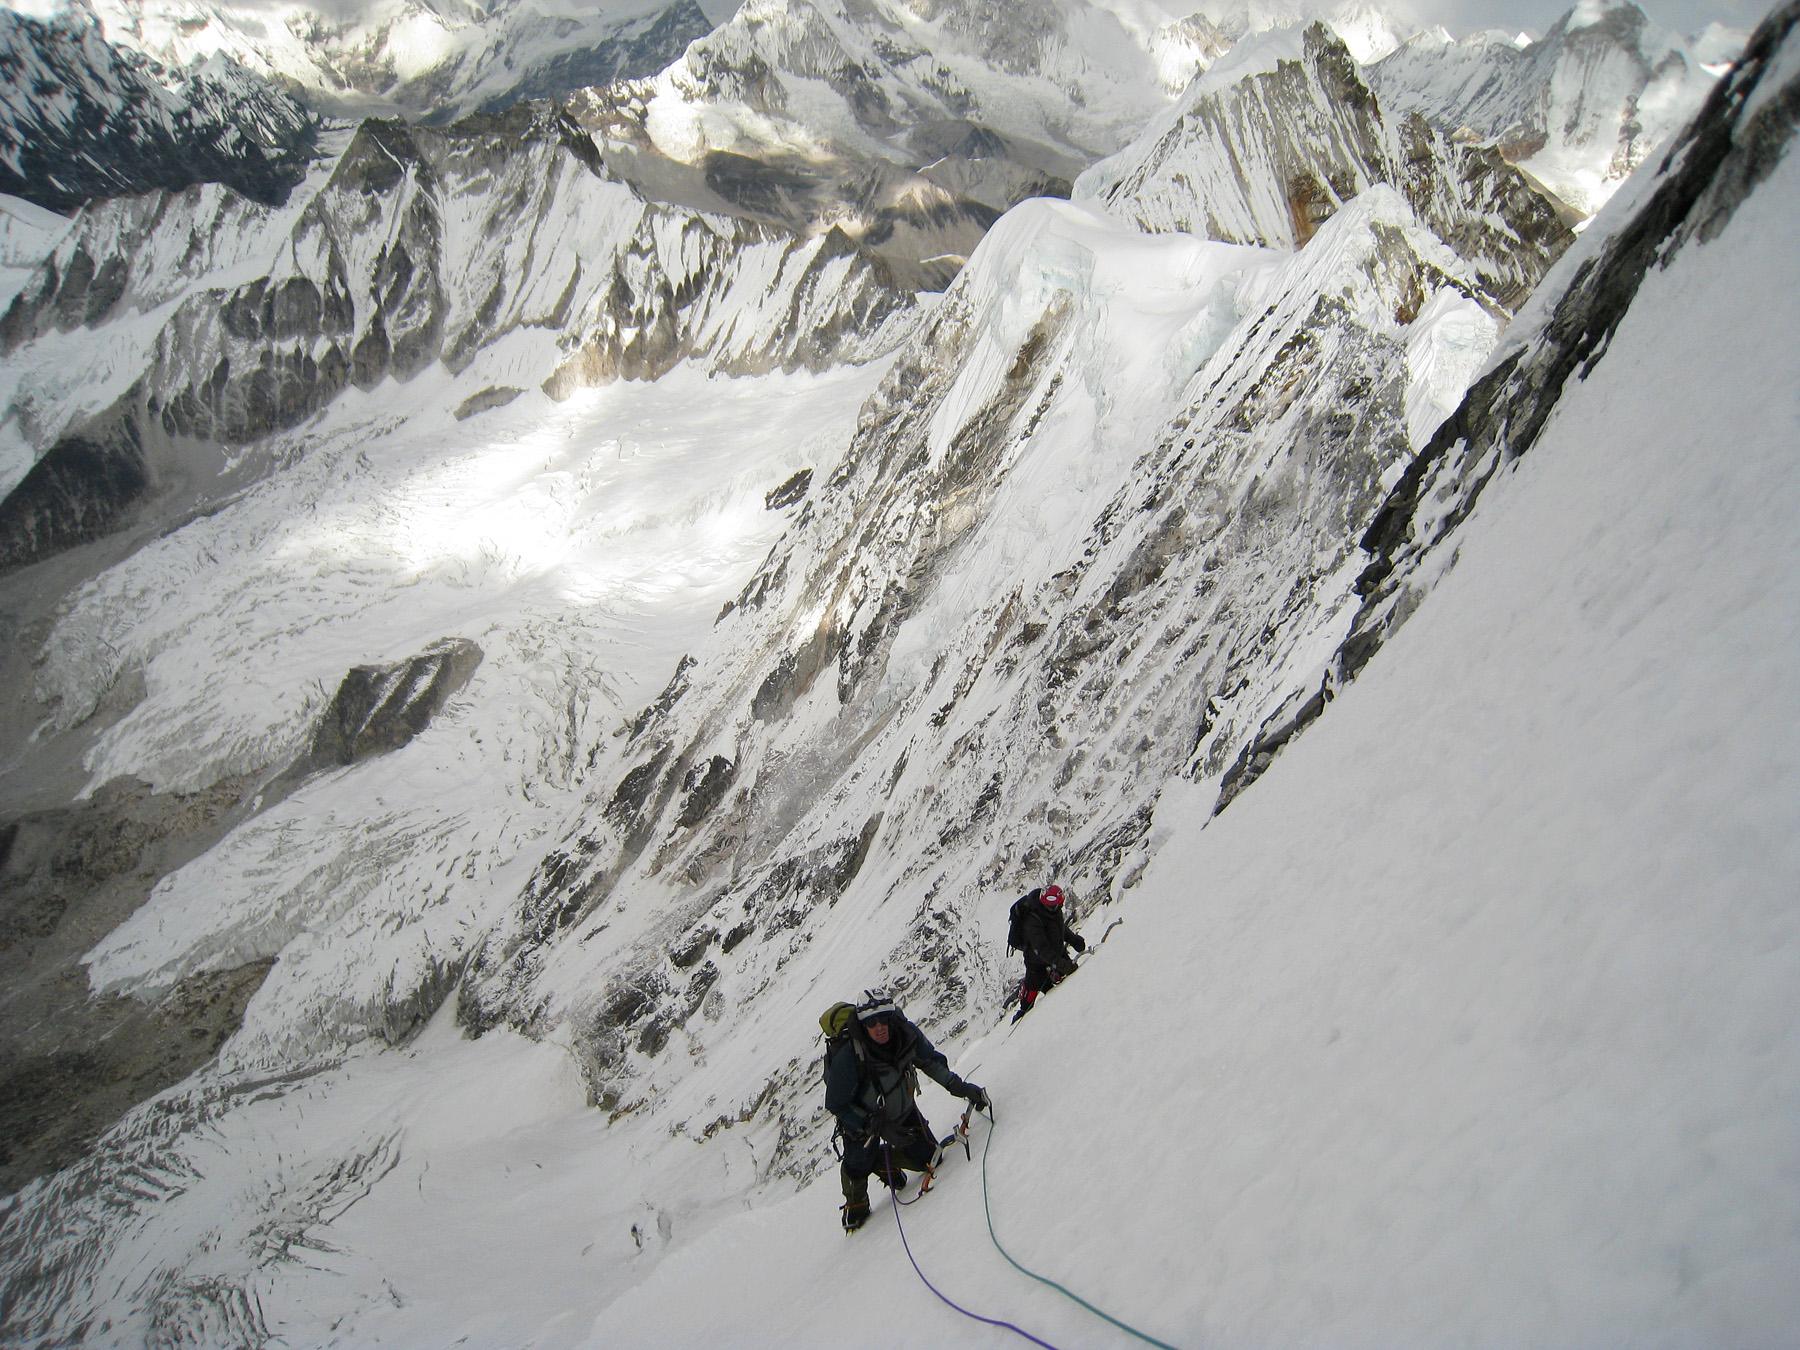 Marcin Michalek and Wojtek Kozub on upper part of north face of Melanphulan. Highest peak on continuation ridge behind is 6,473m; below is upper Nare Glacier.